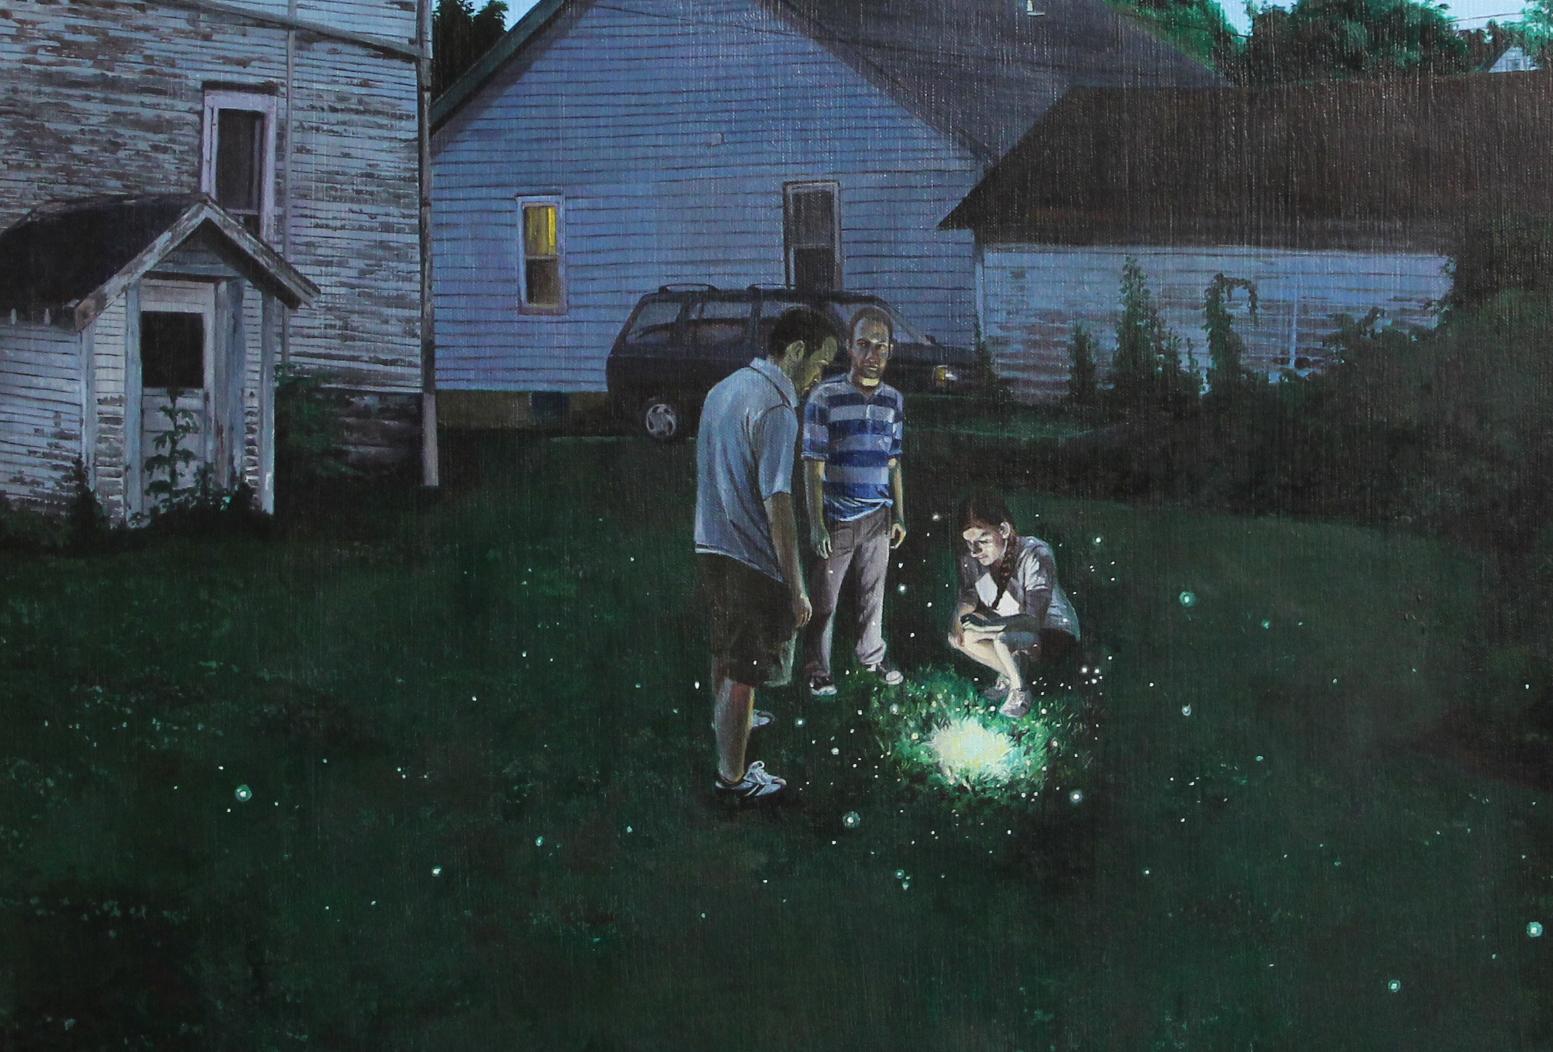 Nate Burbeck,  Fairmont, Minnesota , 2015, Oil on canvas, grayDuck Gallery, Austin, TX